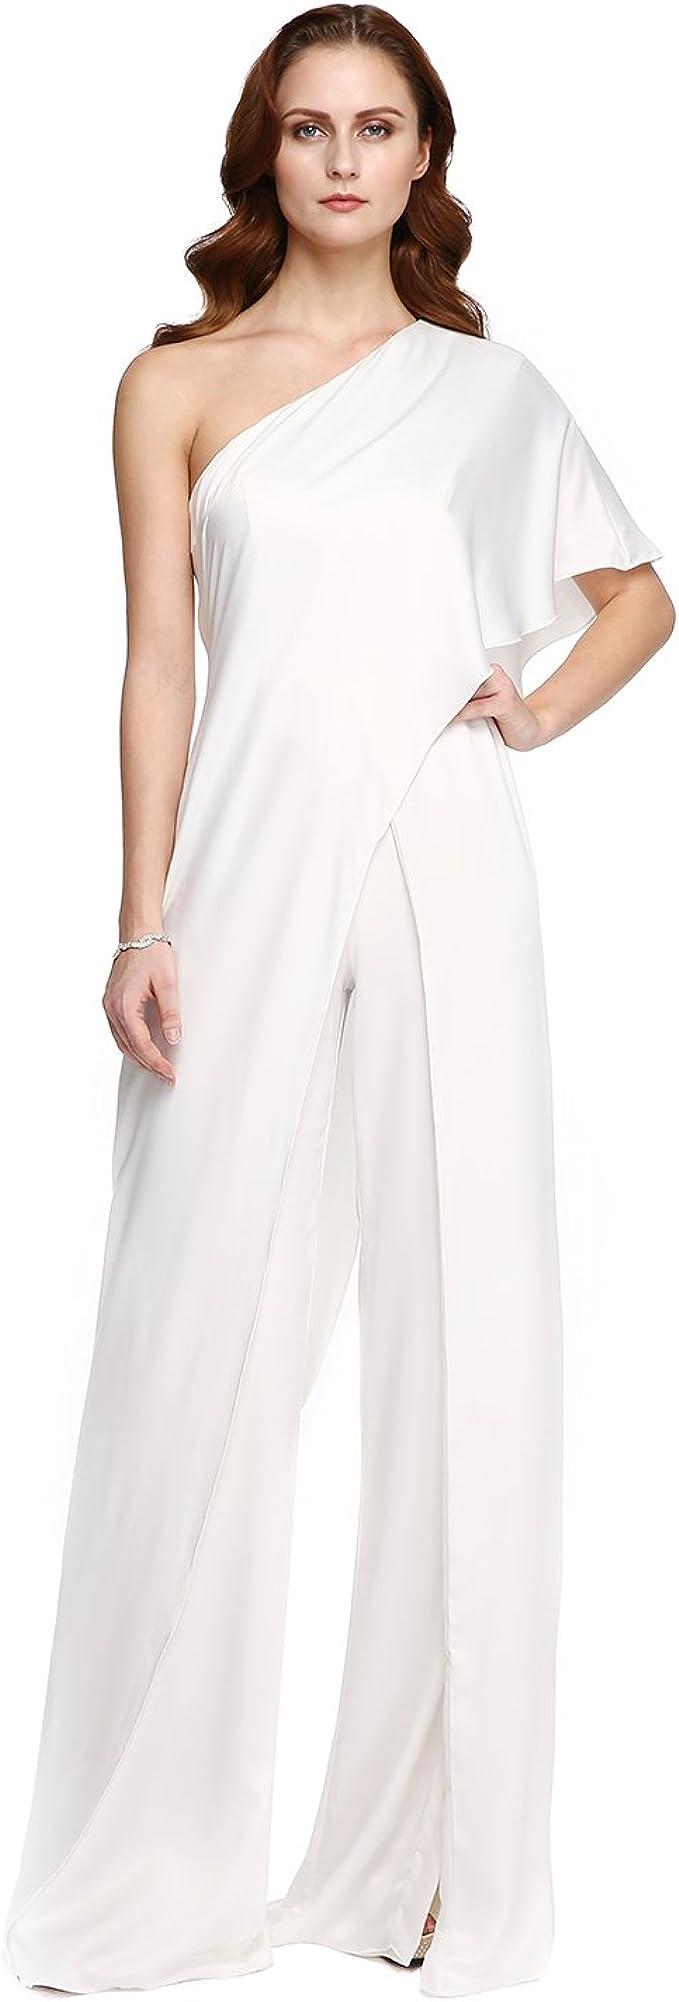 LightInTheBox Damen Jumpsuit formelle Abendkleid Celebrity Style